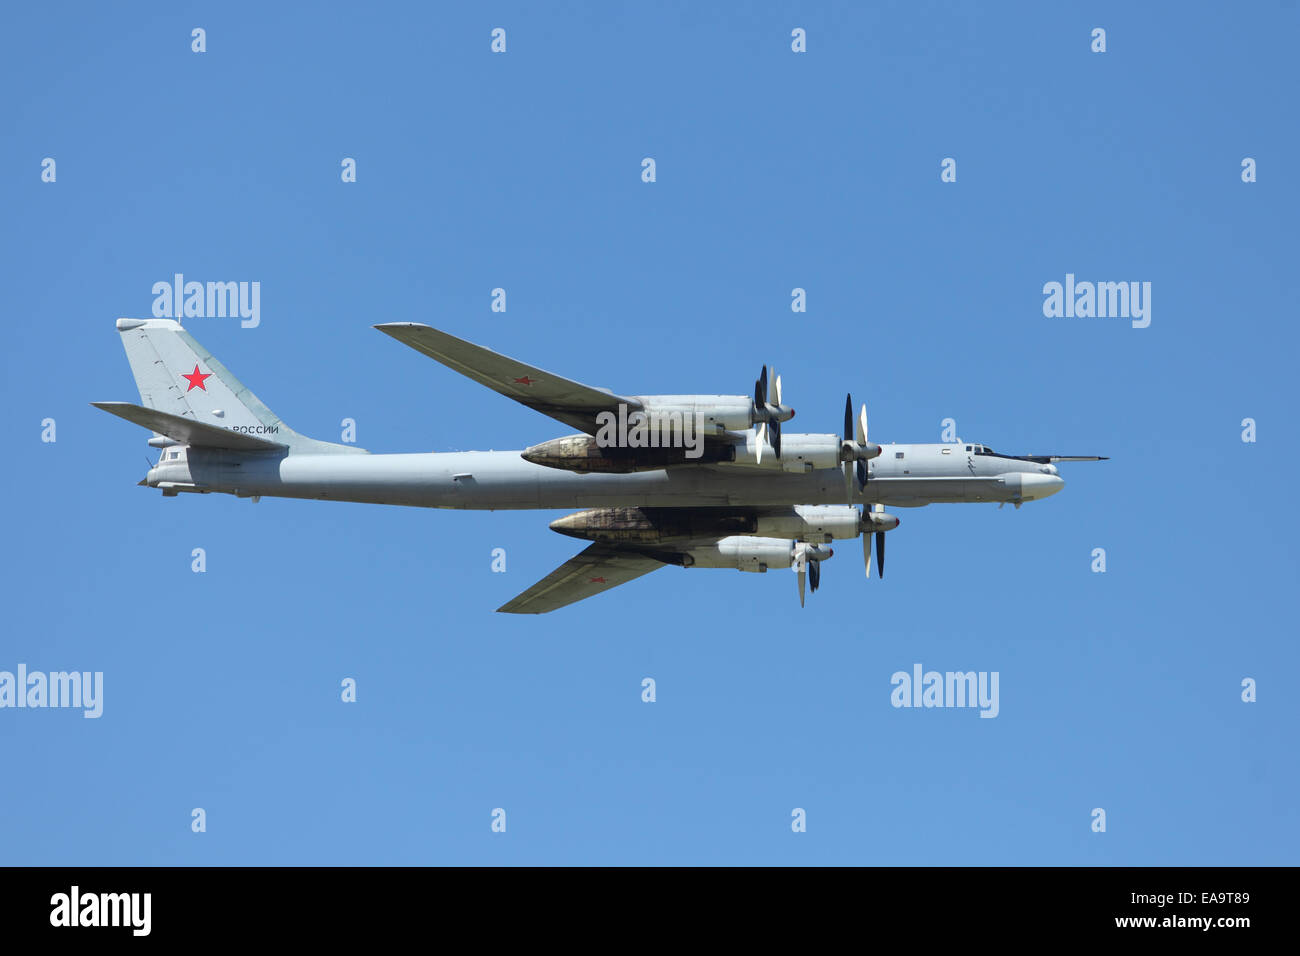 Russian four-engine turboprop-powered strategic bomber TU 95 MS - Stock Image